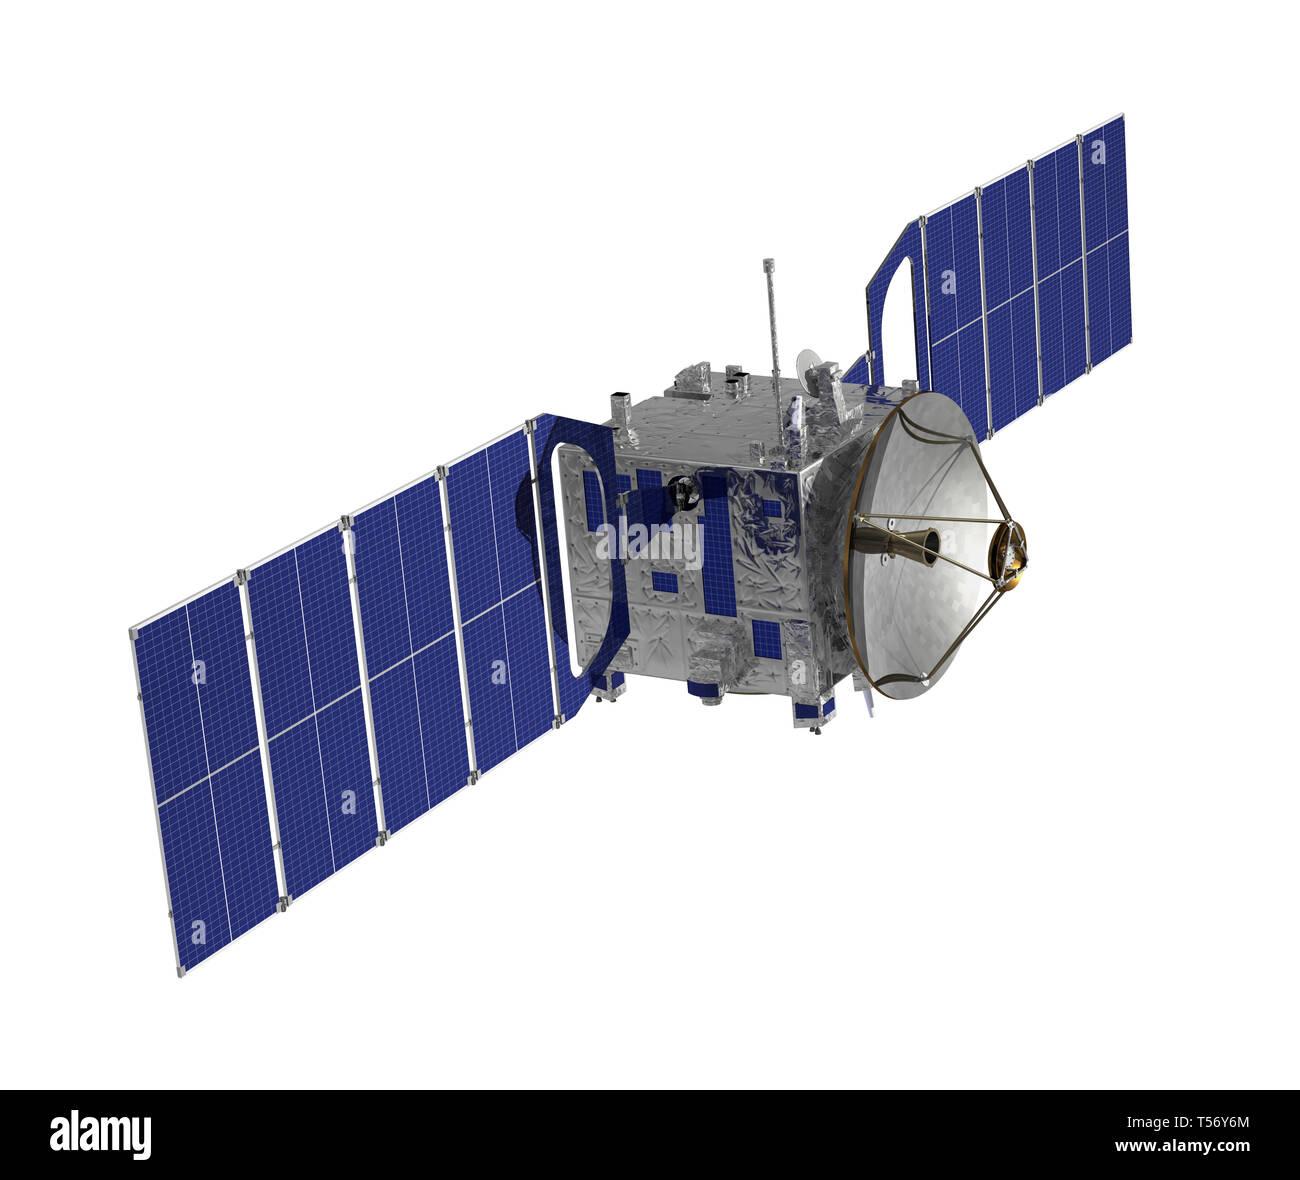 Communication Space Satellite Isolated On White Background. 3D Illustration. - Stock Image